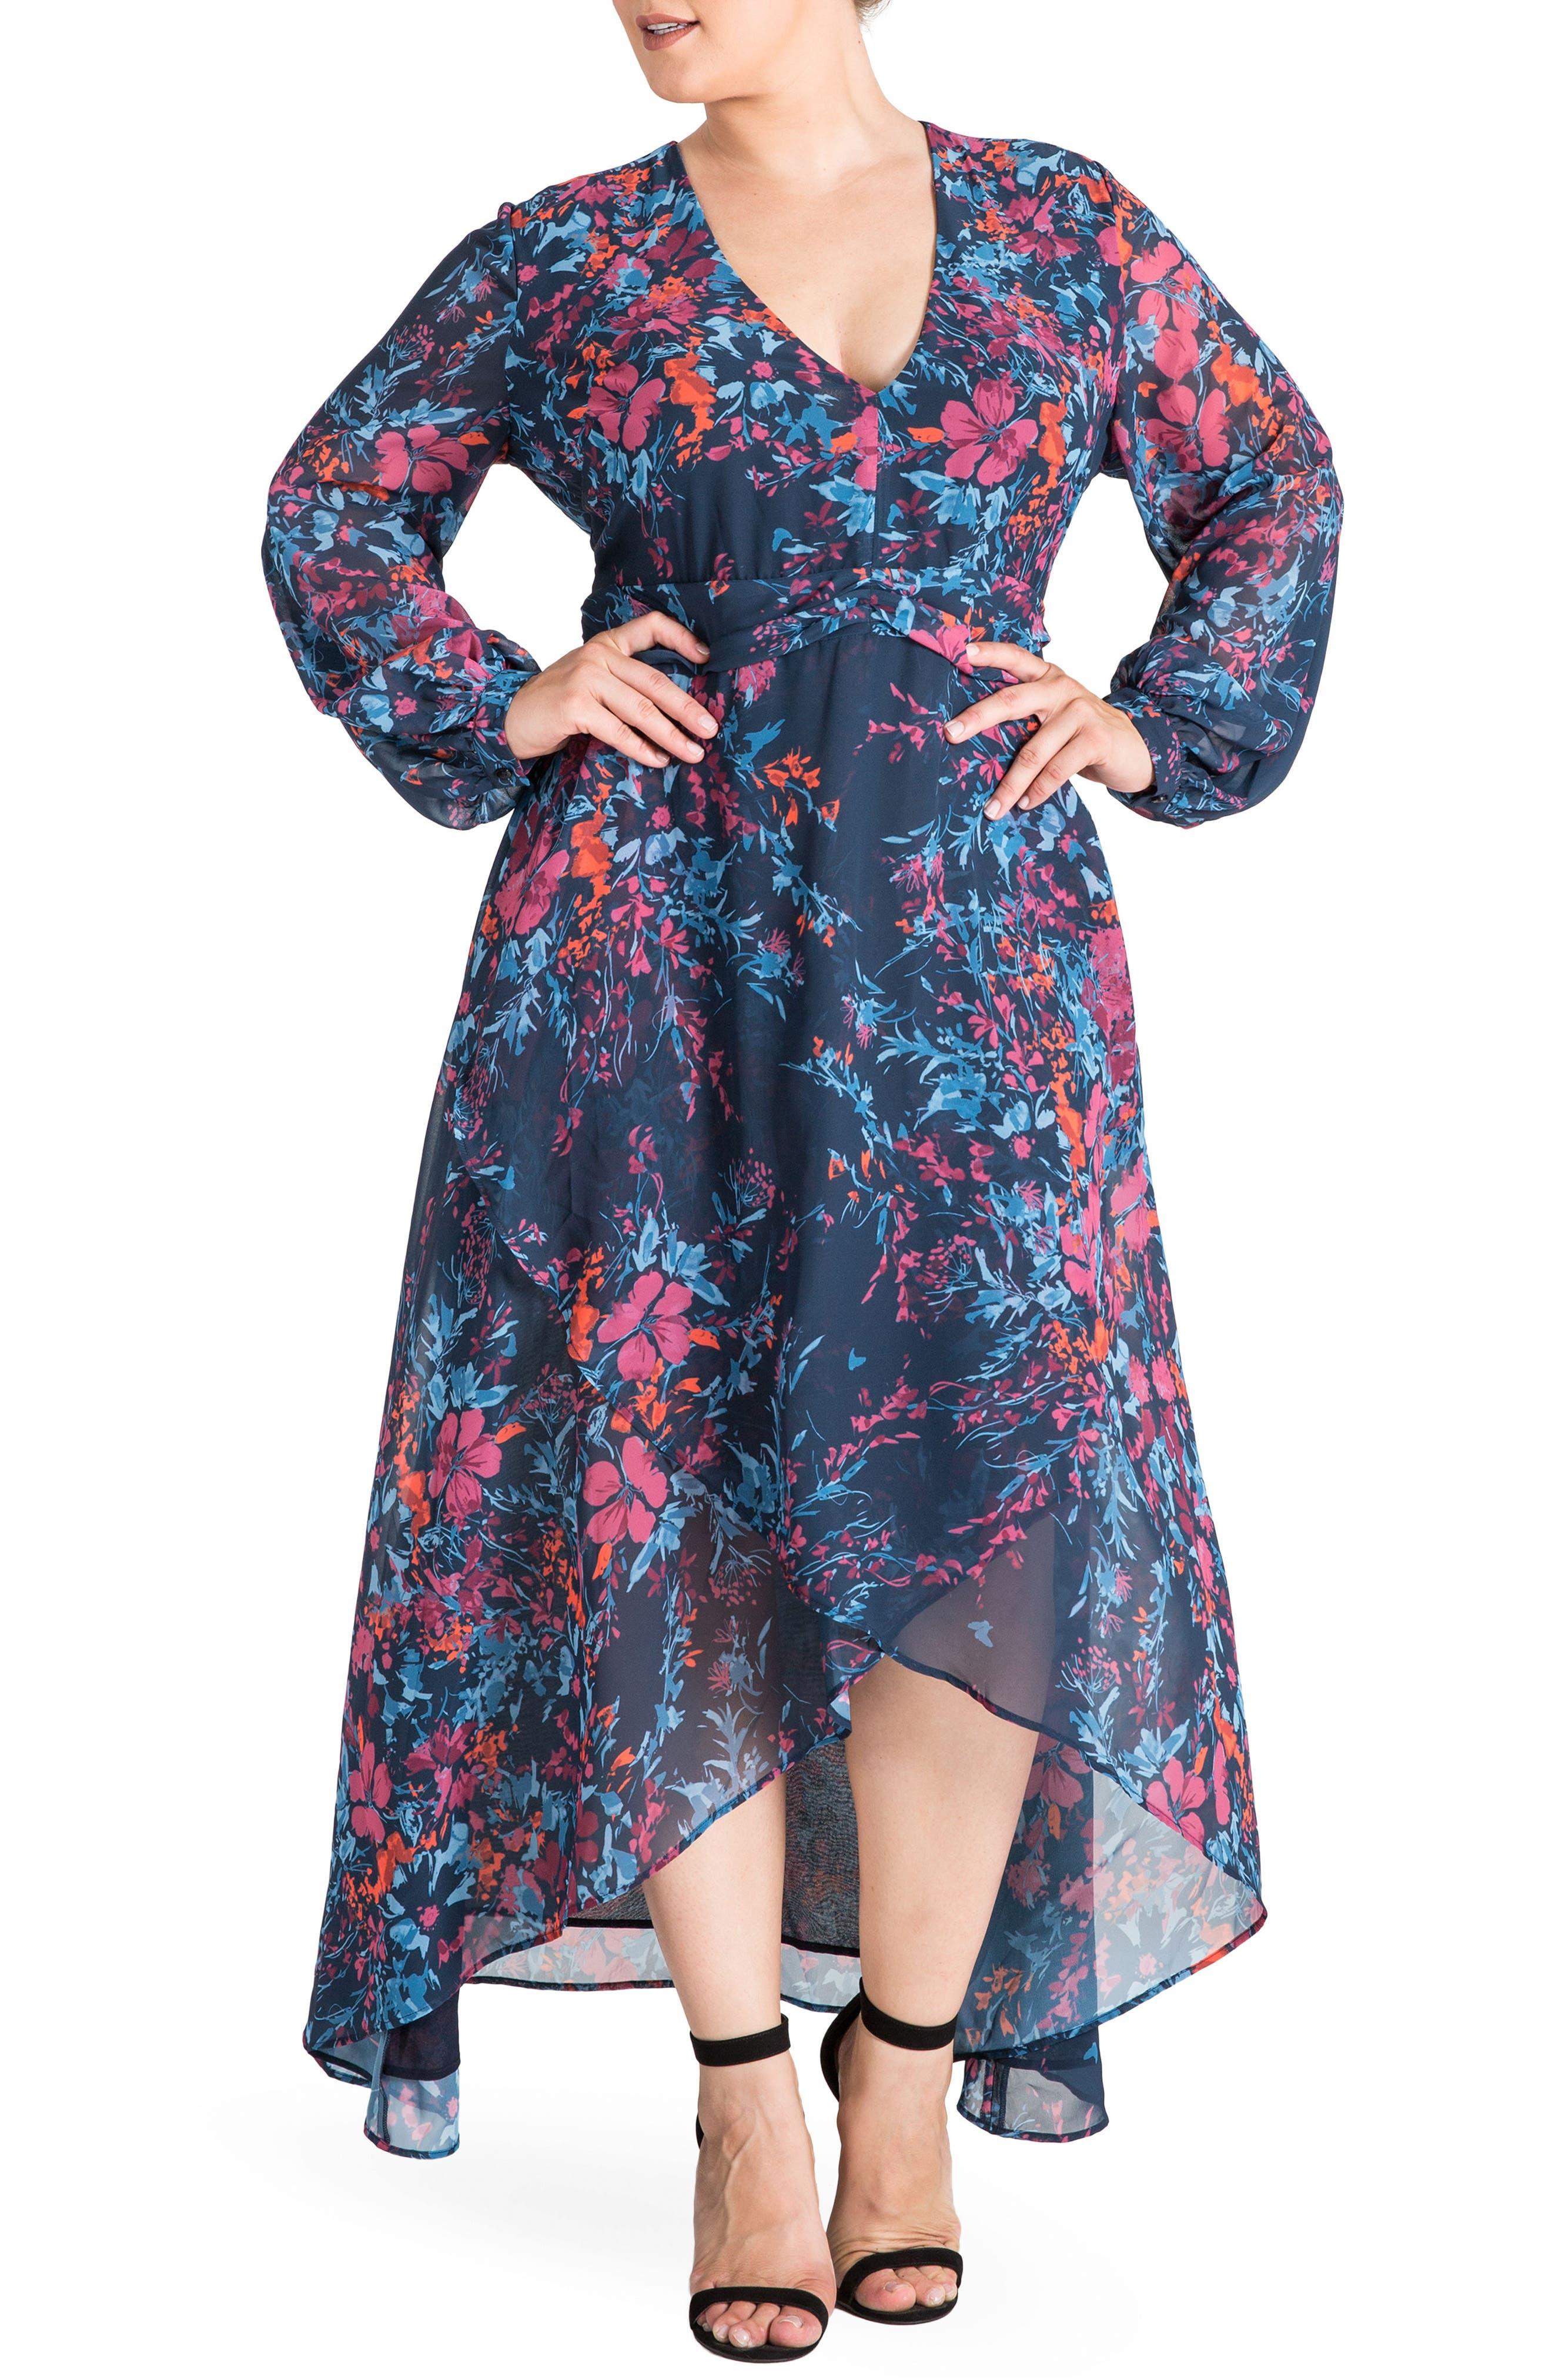 Floral Chiffon Maxi Dress,                             Main thumbnail 1, color,                             Floral Print